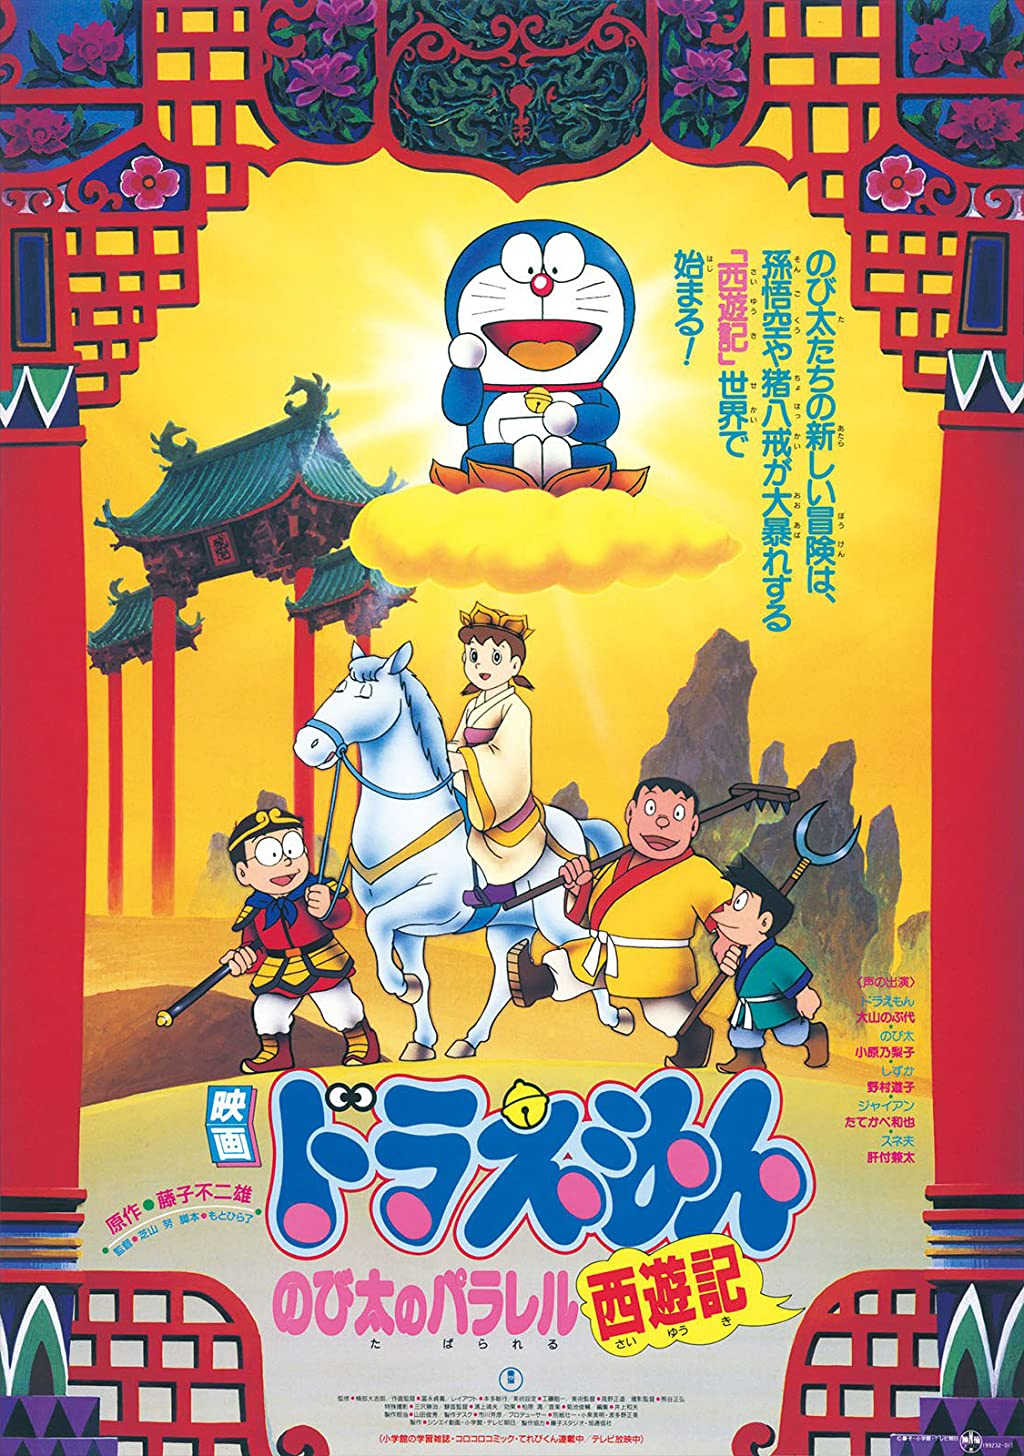 Doraemon: Nobita Tây Du Kí